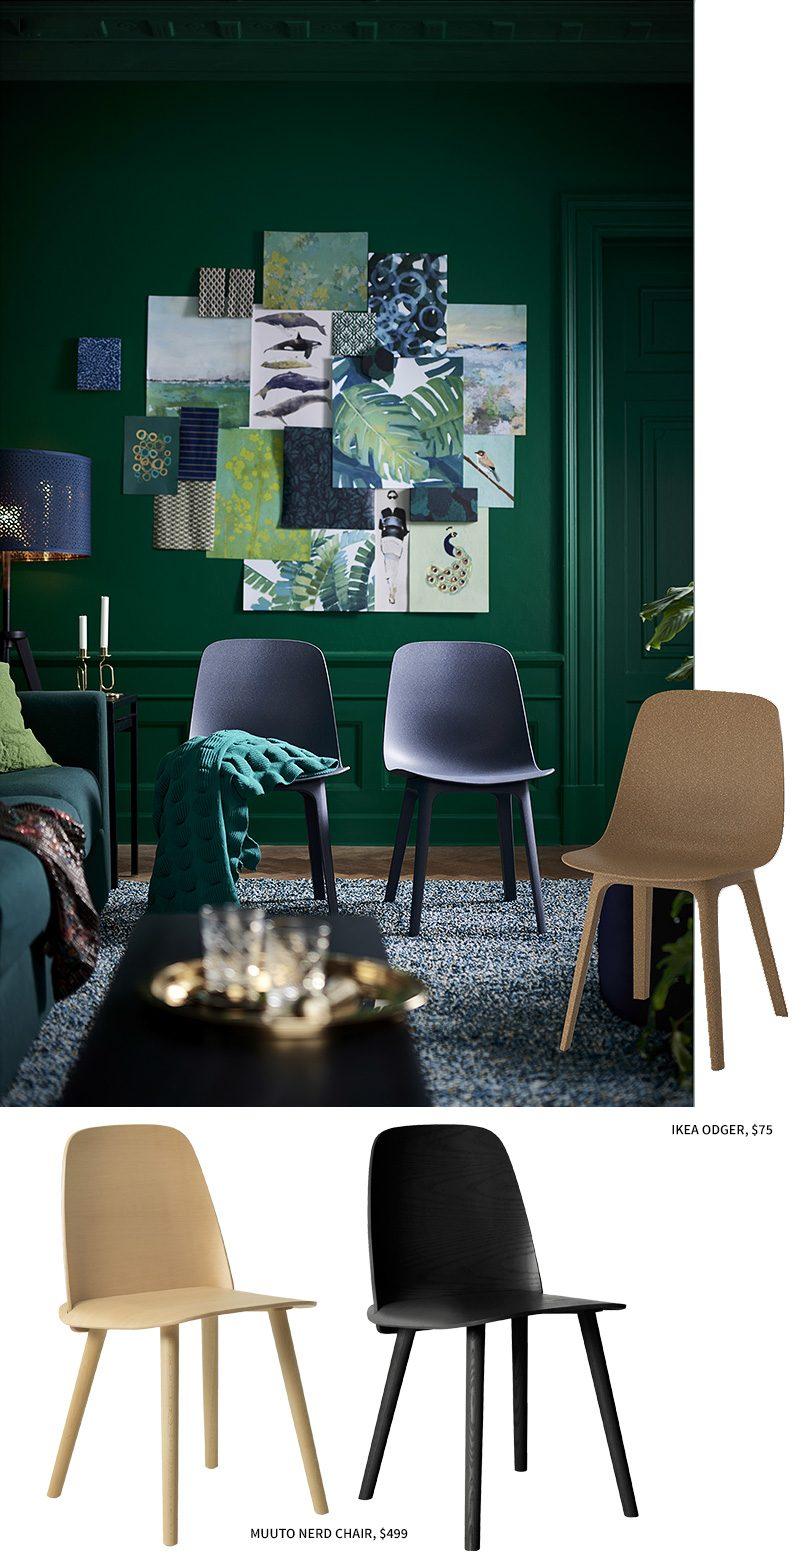 IKEA ODGER Chair vs. Muuto Nerd Chair